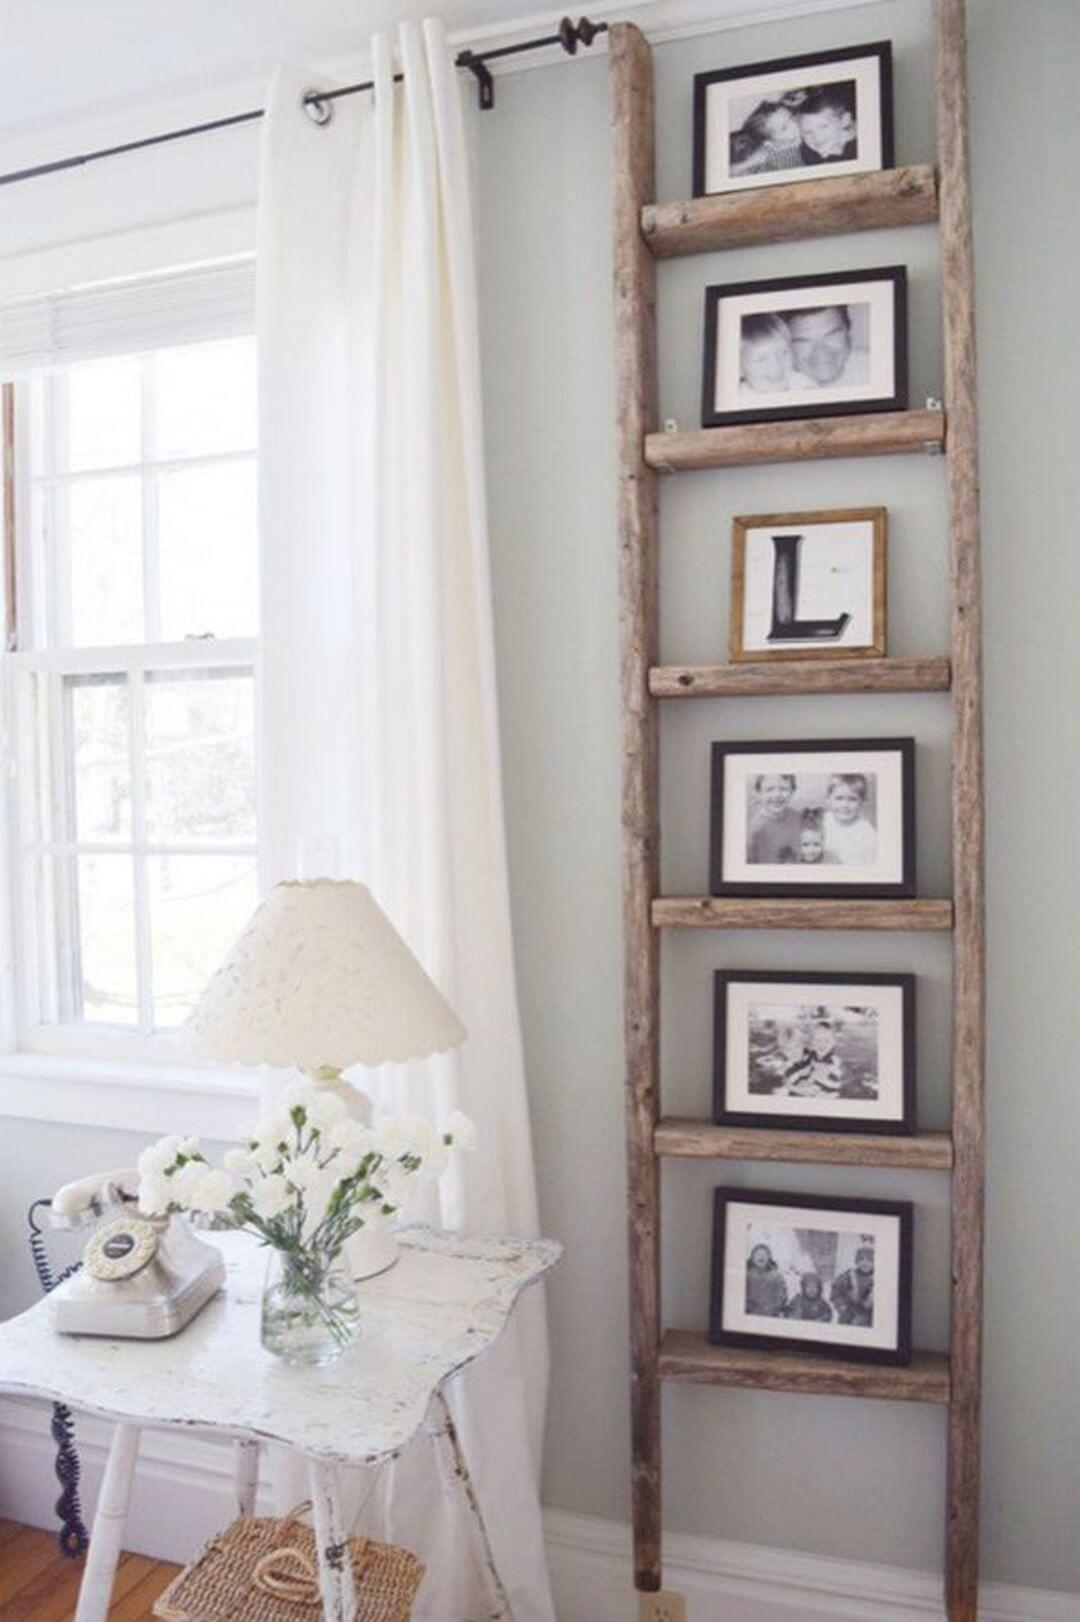 Rustic kitchen window decor   rustic farmhouse bedroom design and decor ideas to transform your